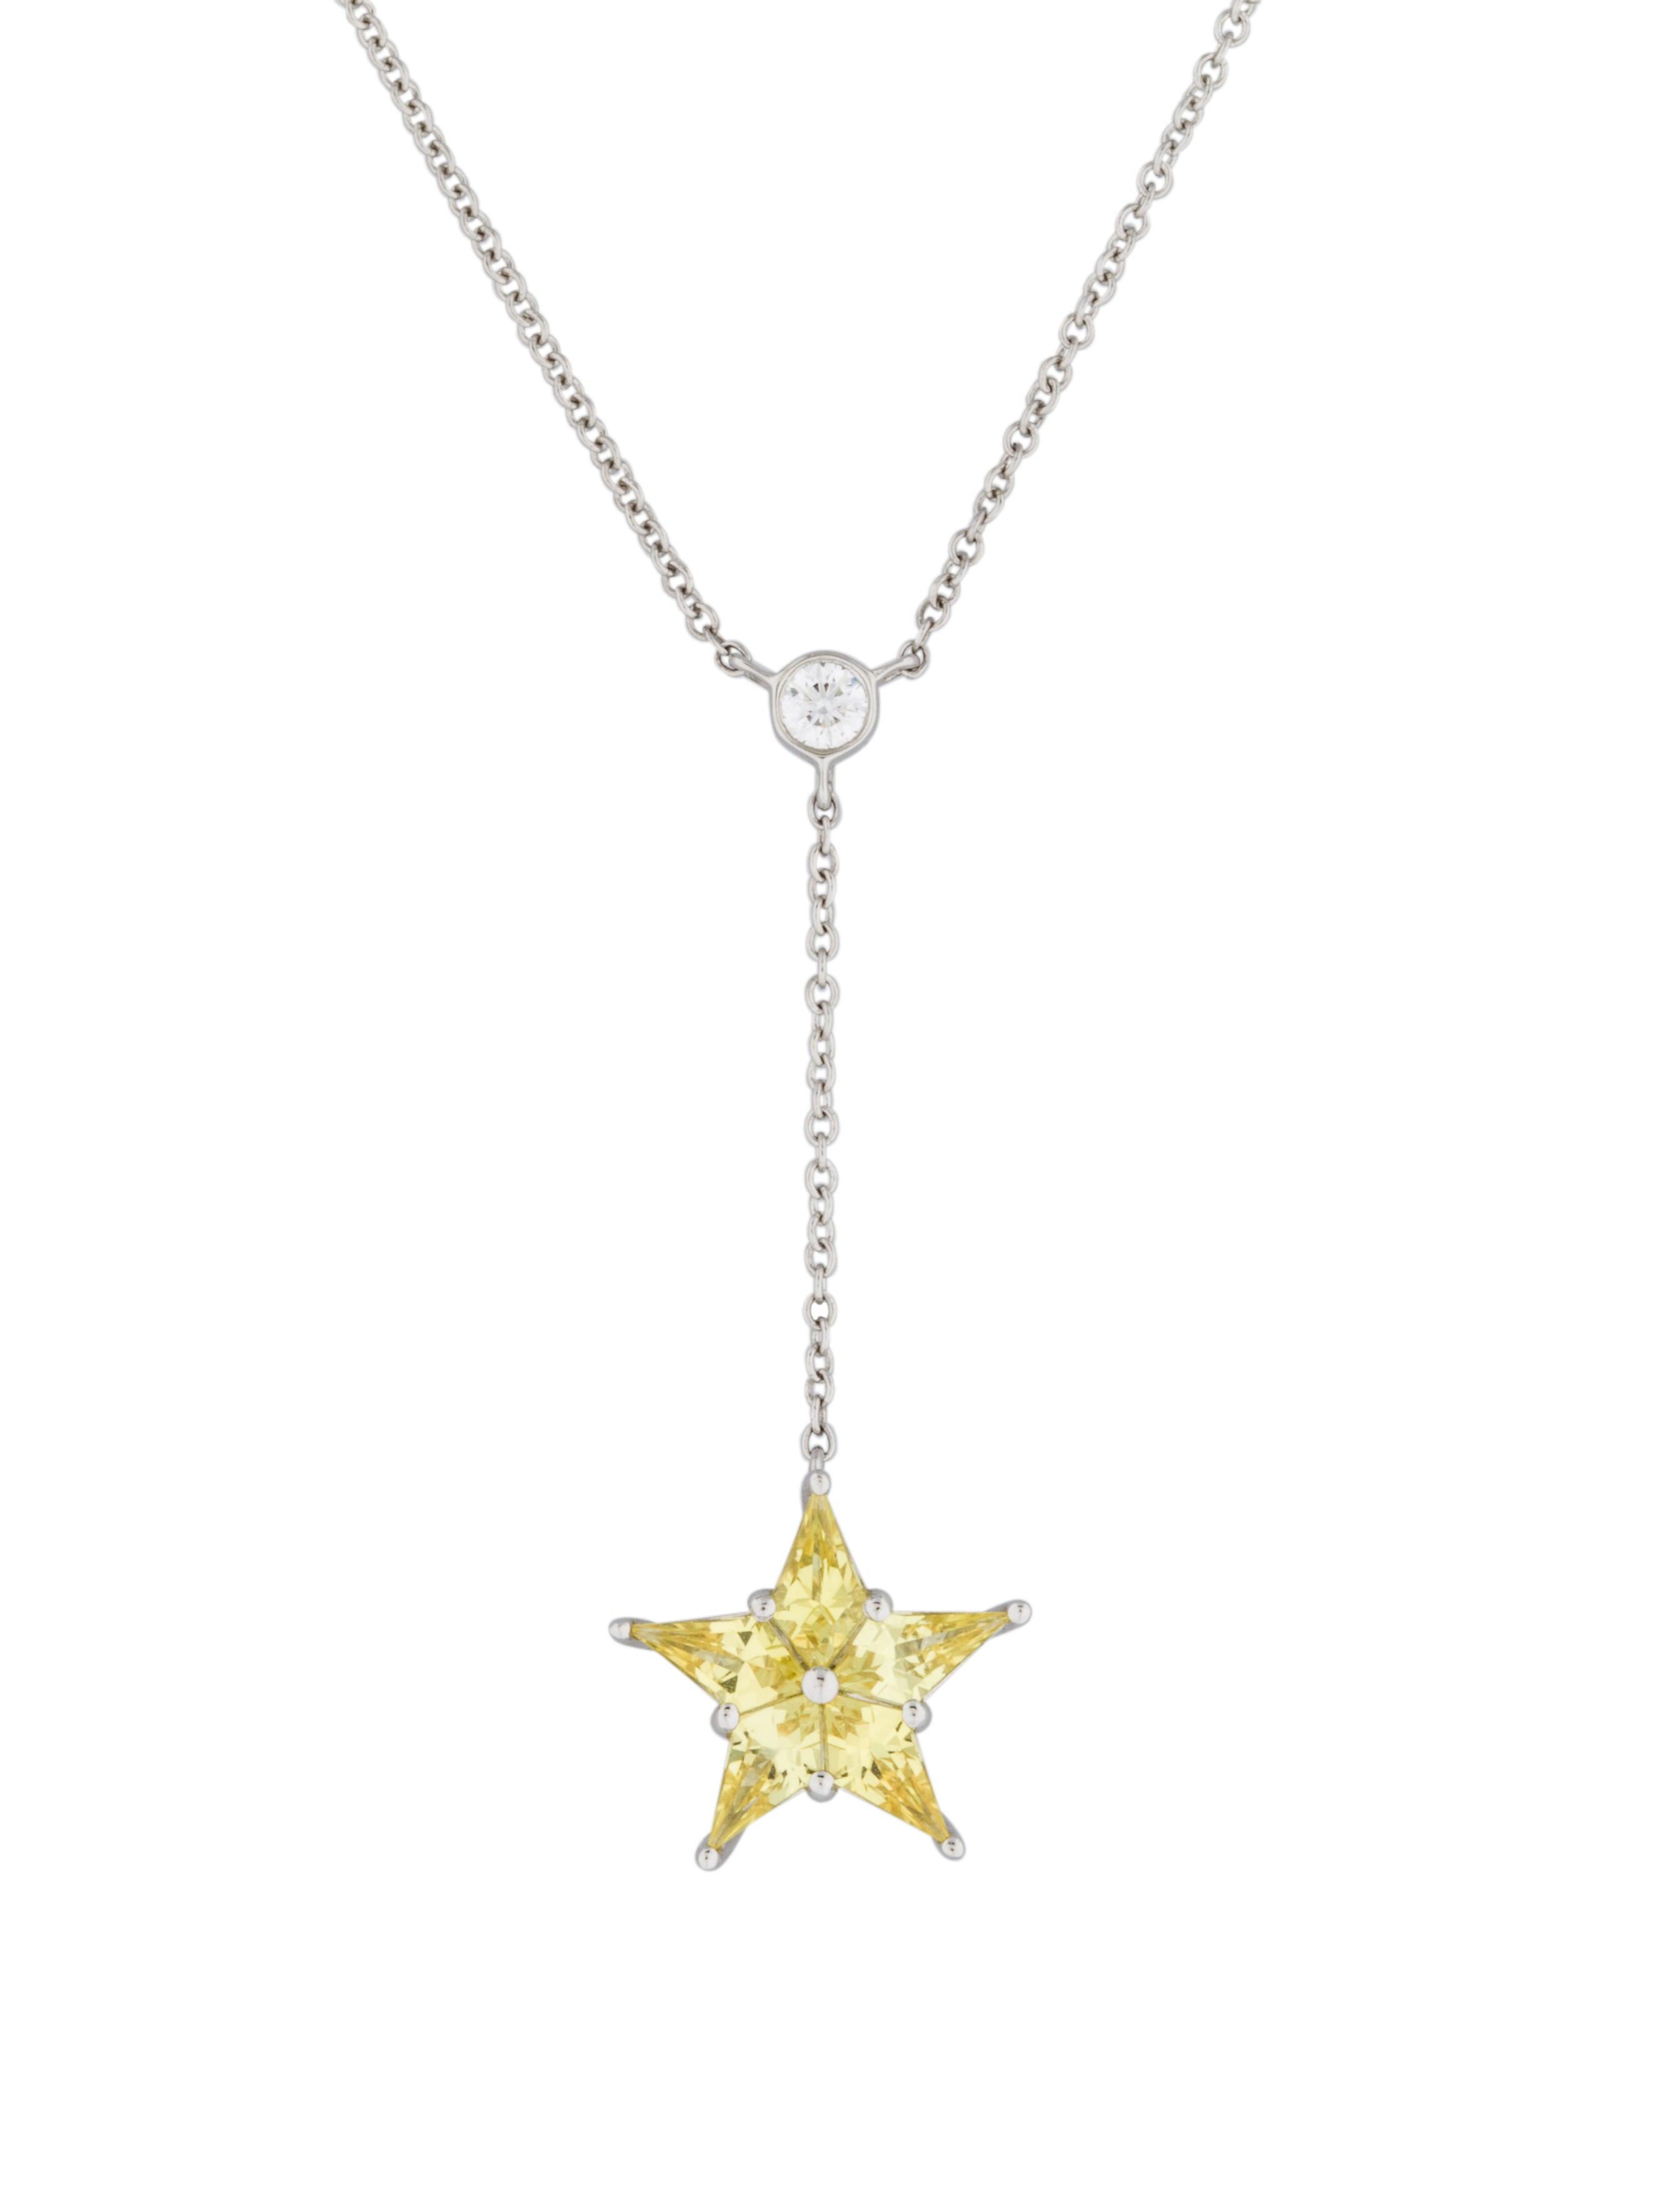 ae1c924c2 Tiffany & Co. Sapphire Star & Diamond Pendant Necklace - Necklaces ...